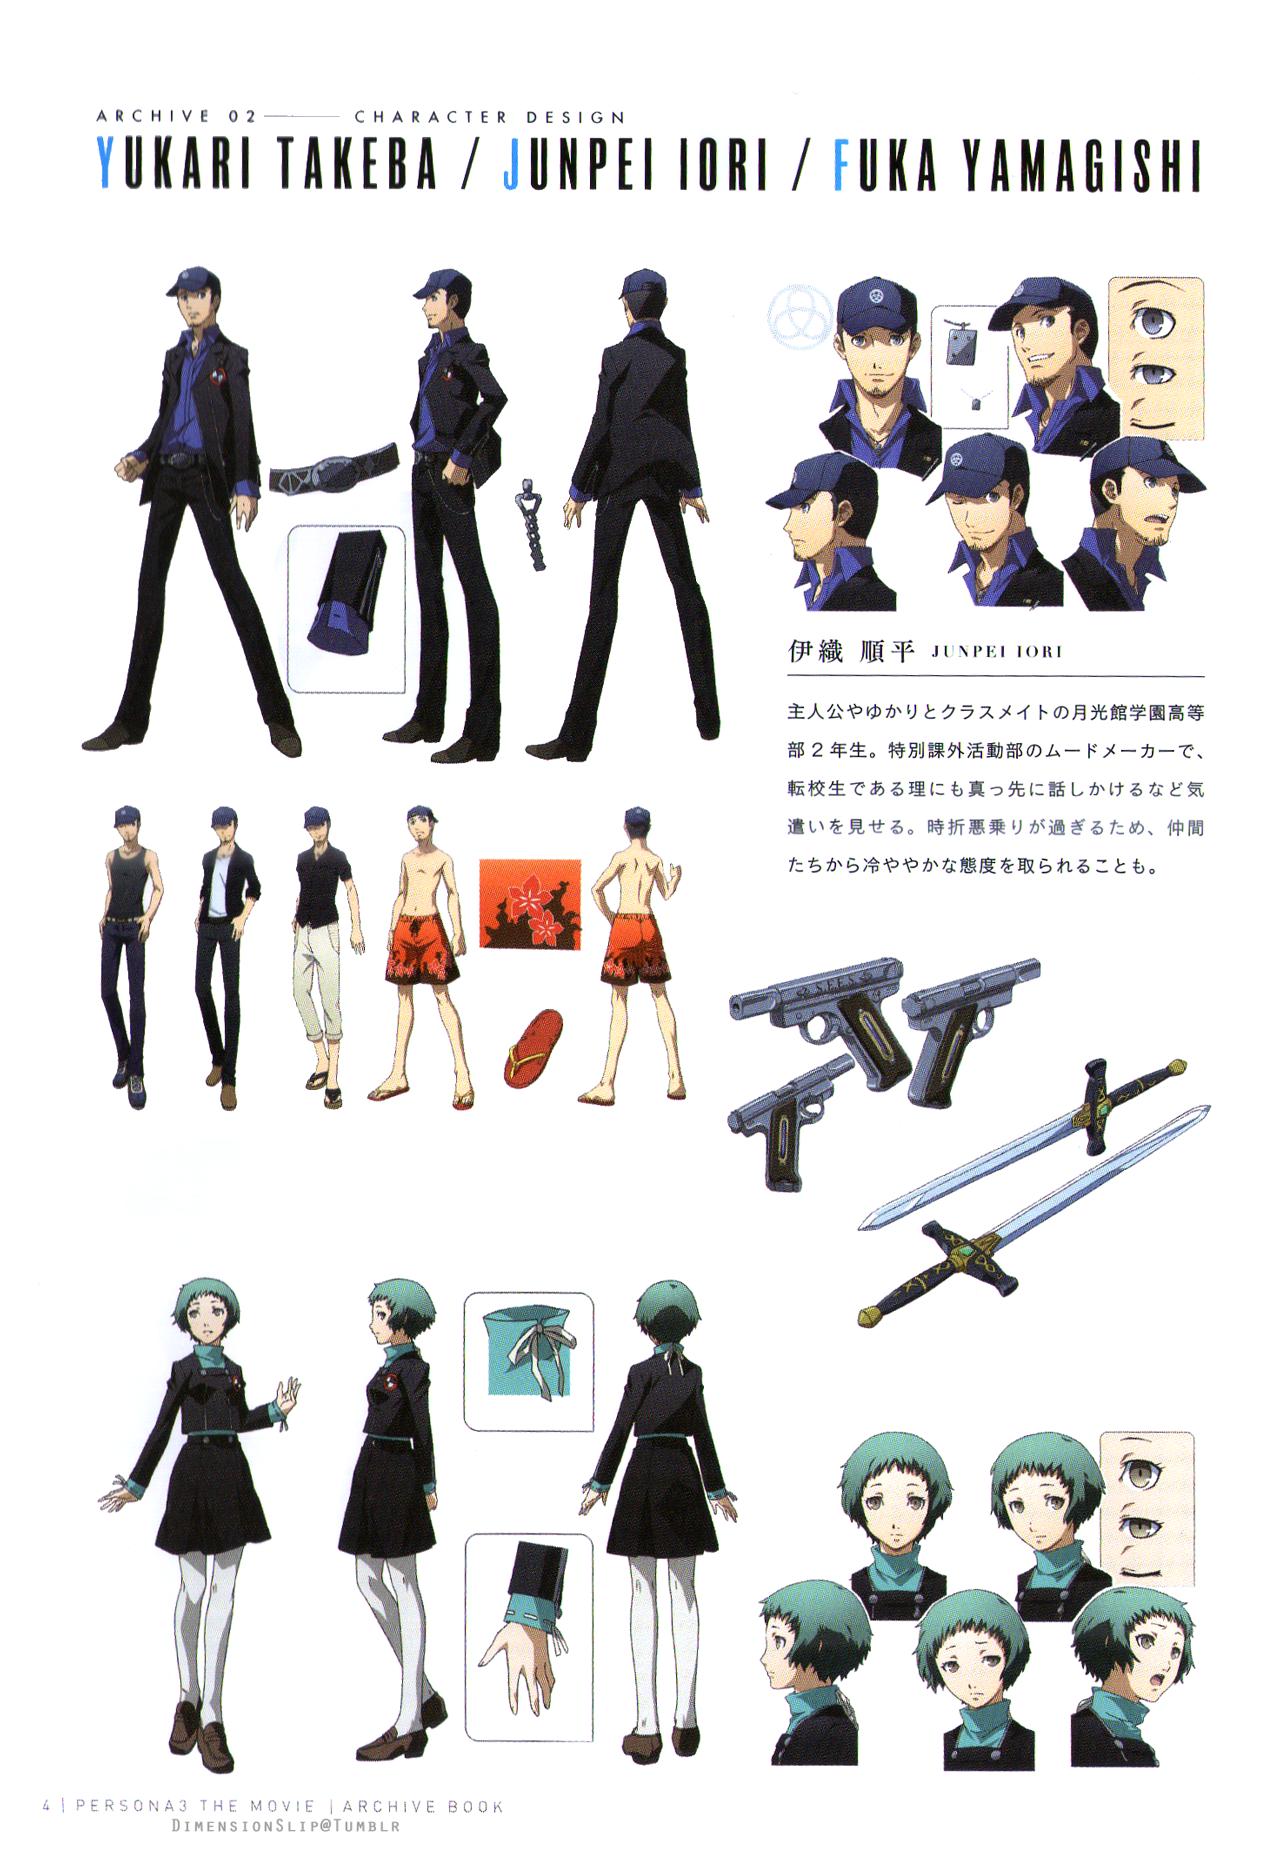 Tales Of Persona Persona Persona 3 Portable Character Concept